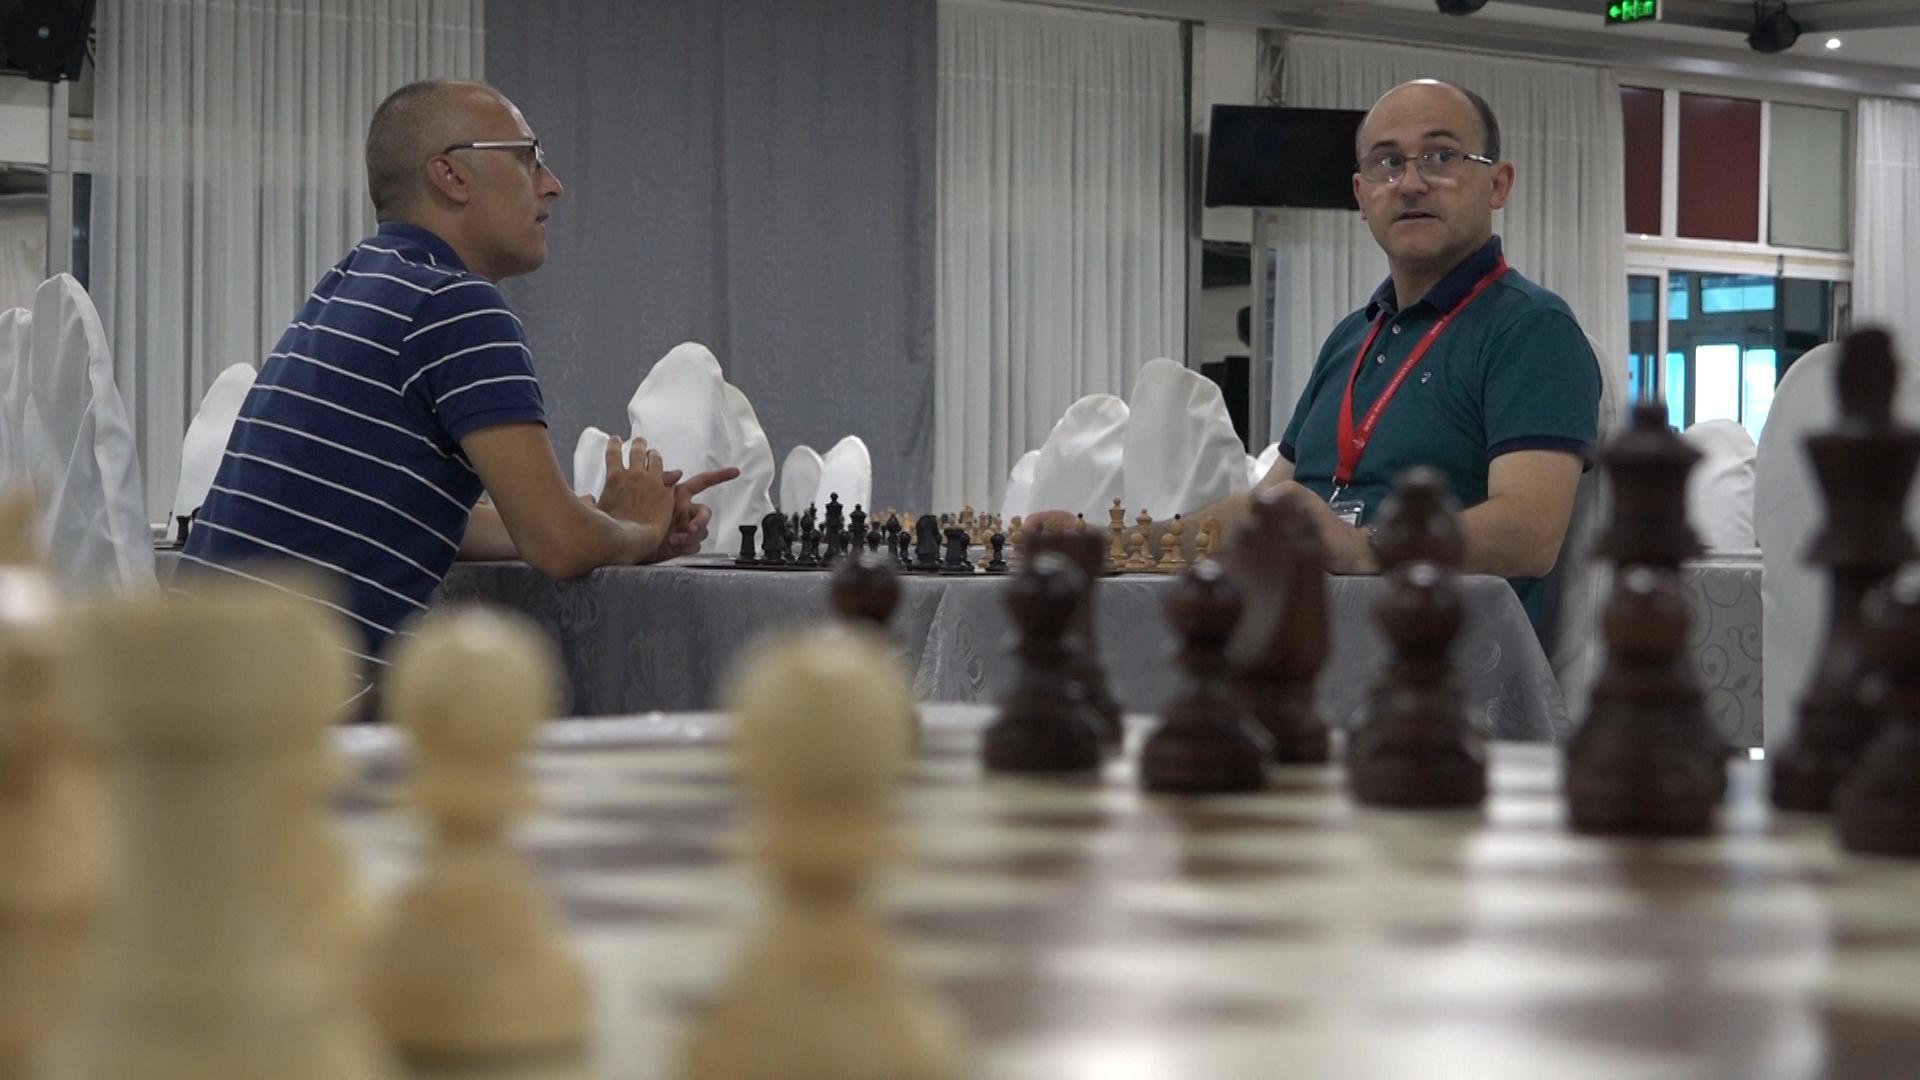 Poslednje pripreme pred početak 14. Šahovskog festivala